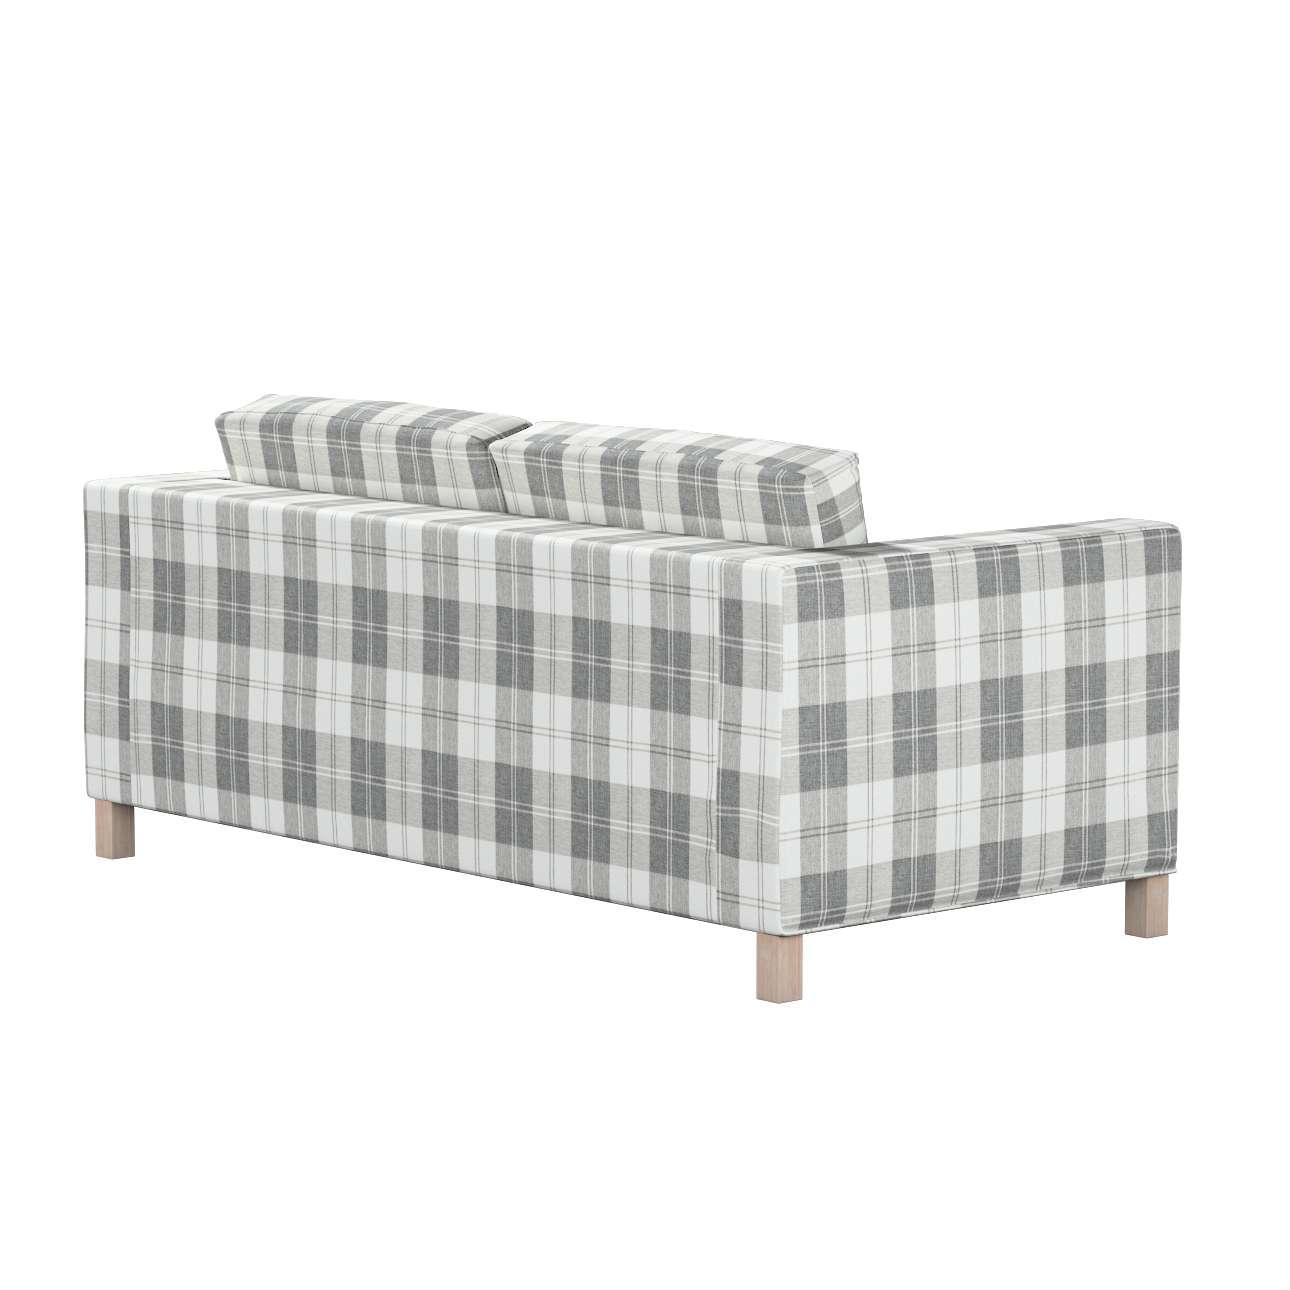 Potah na pohovku IKEA  Karlanda rozkládací, krátký v kolekci Edinburgh, látka: 115-79